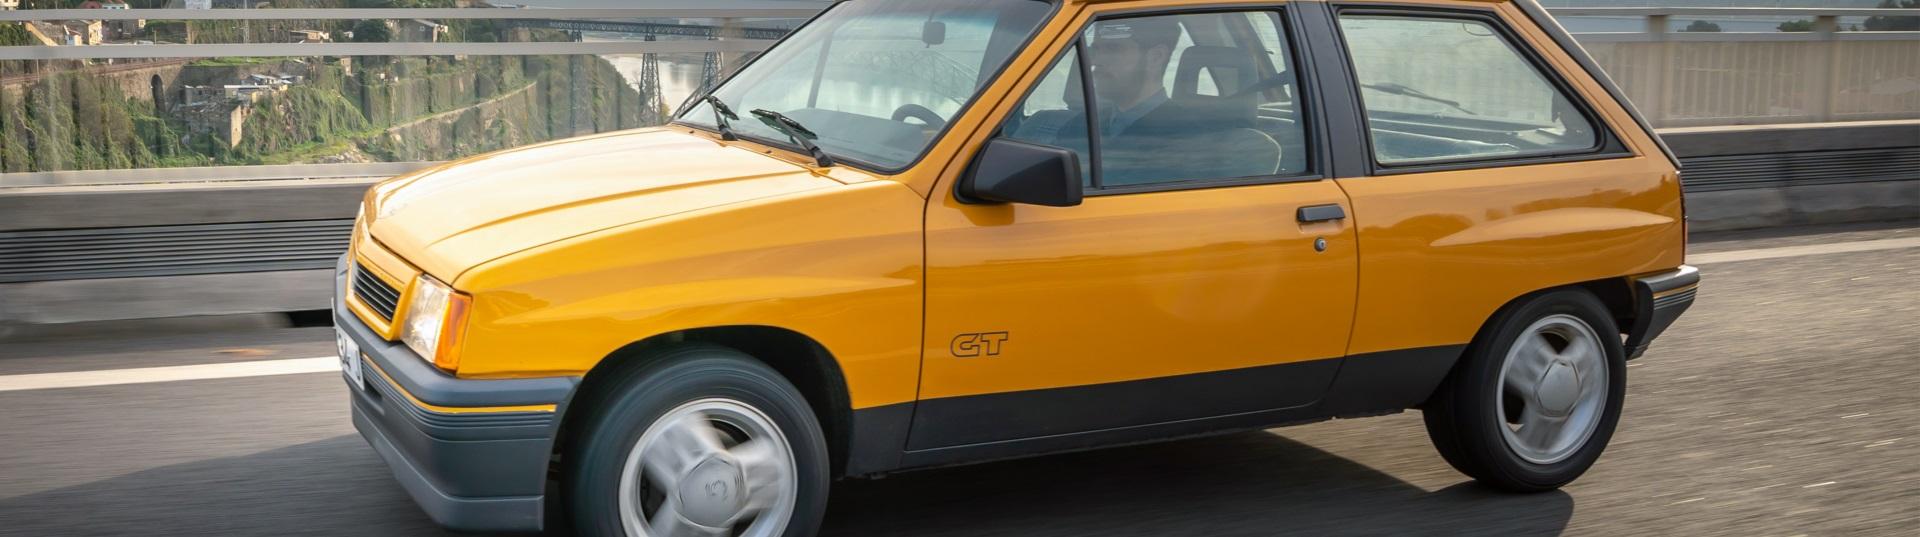 Corsa GT_1987_1920